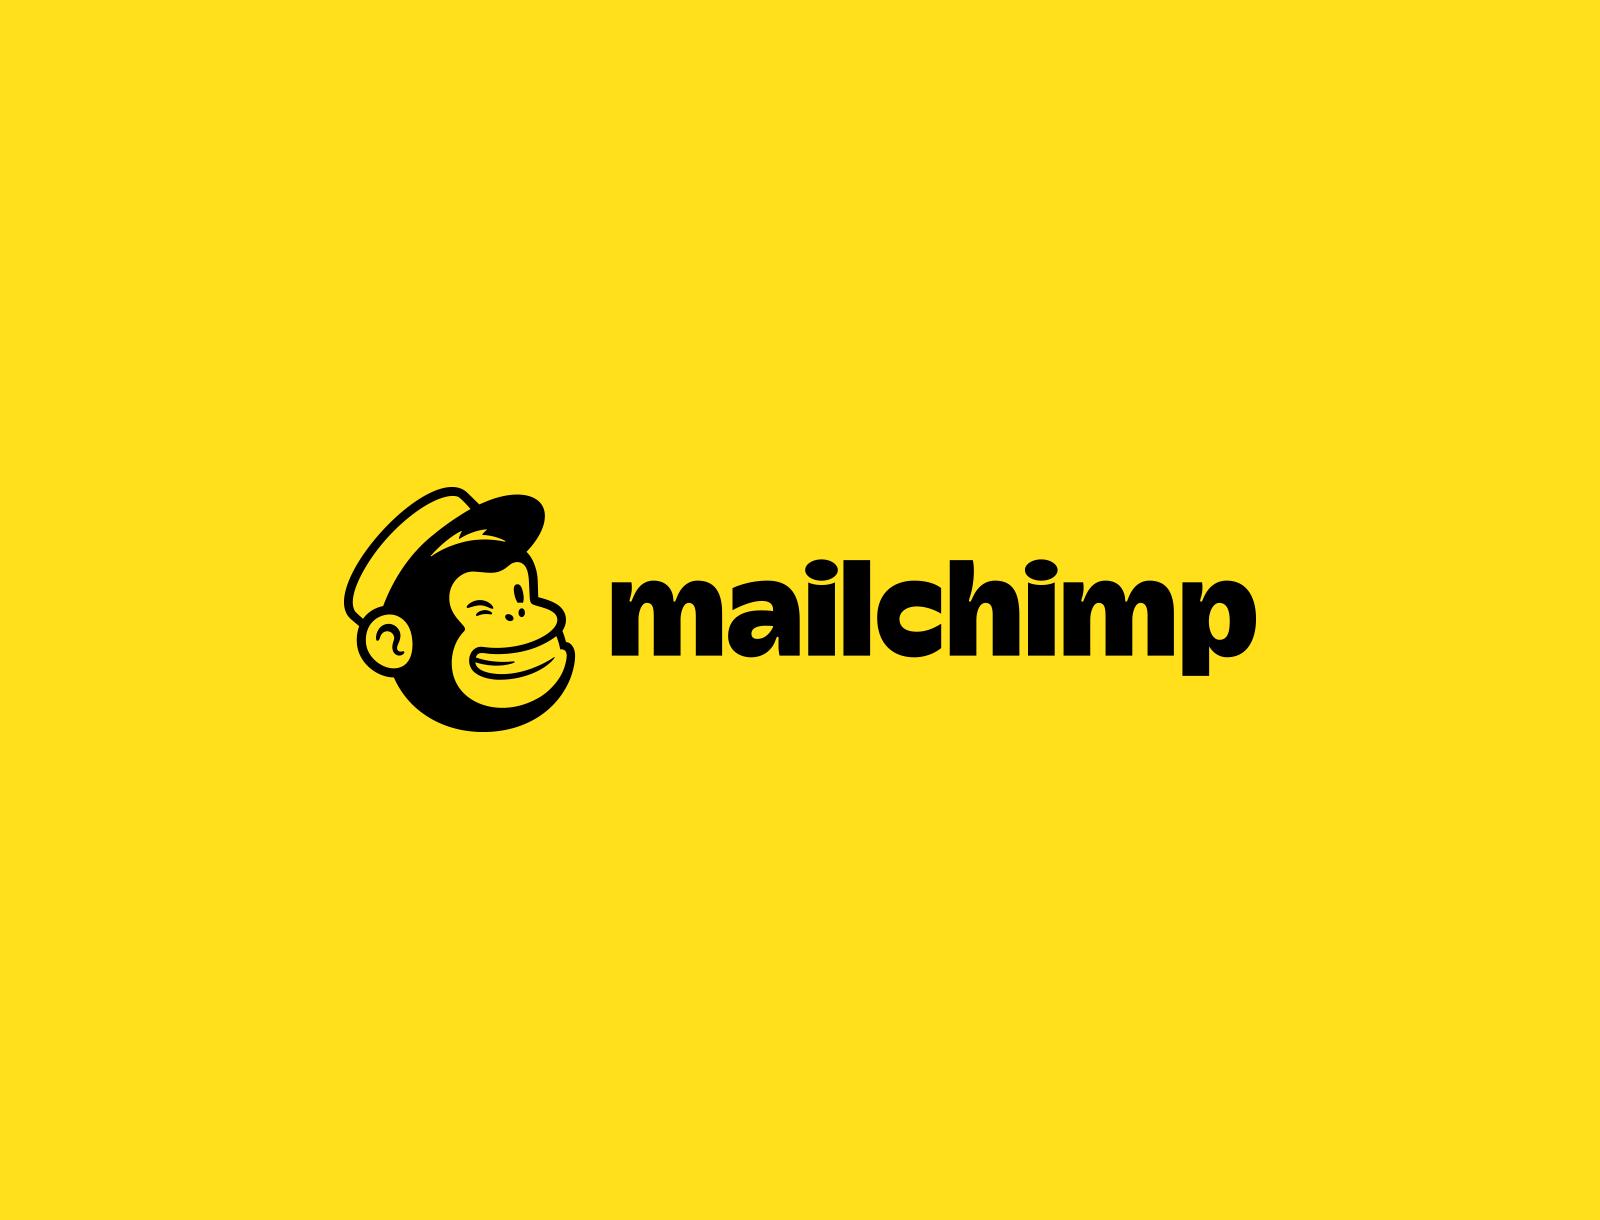 mailchimp sanders retail